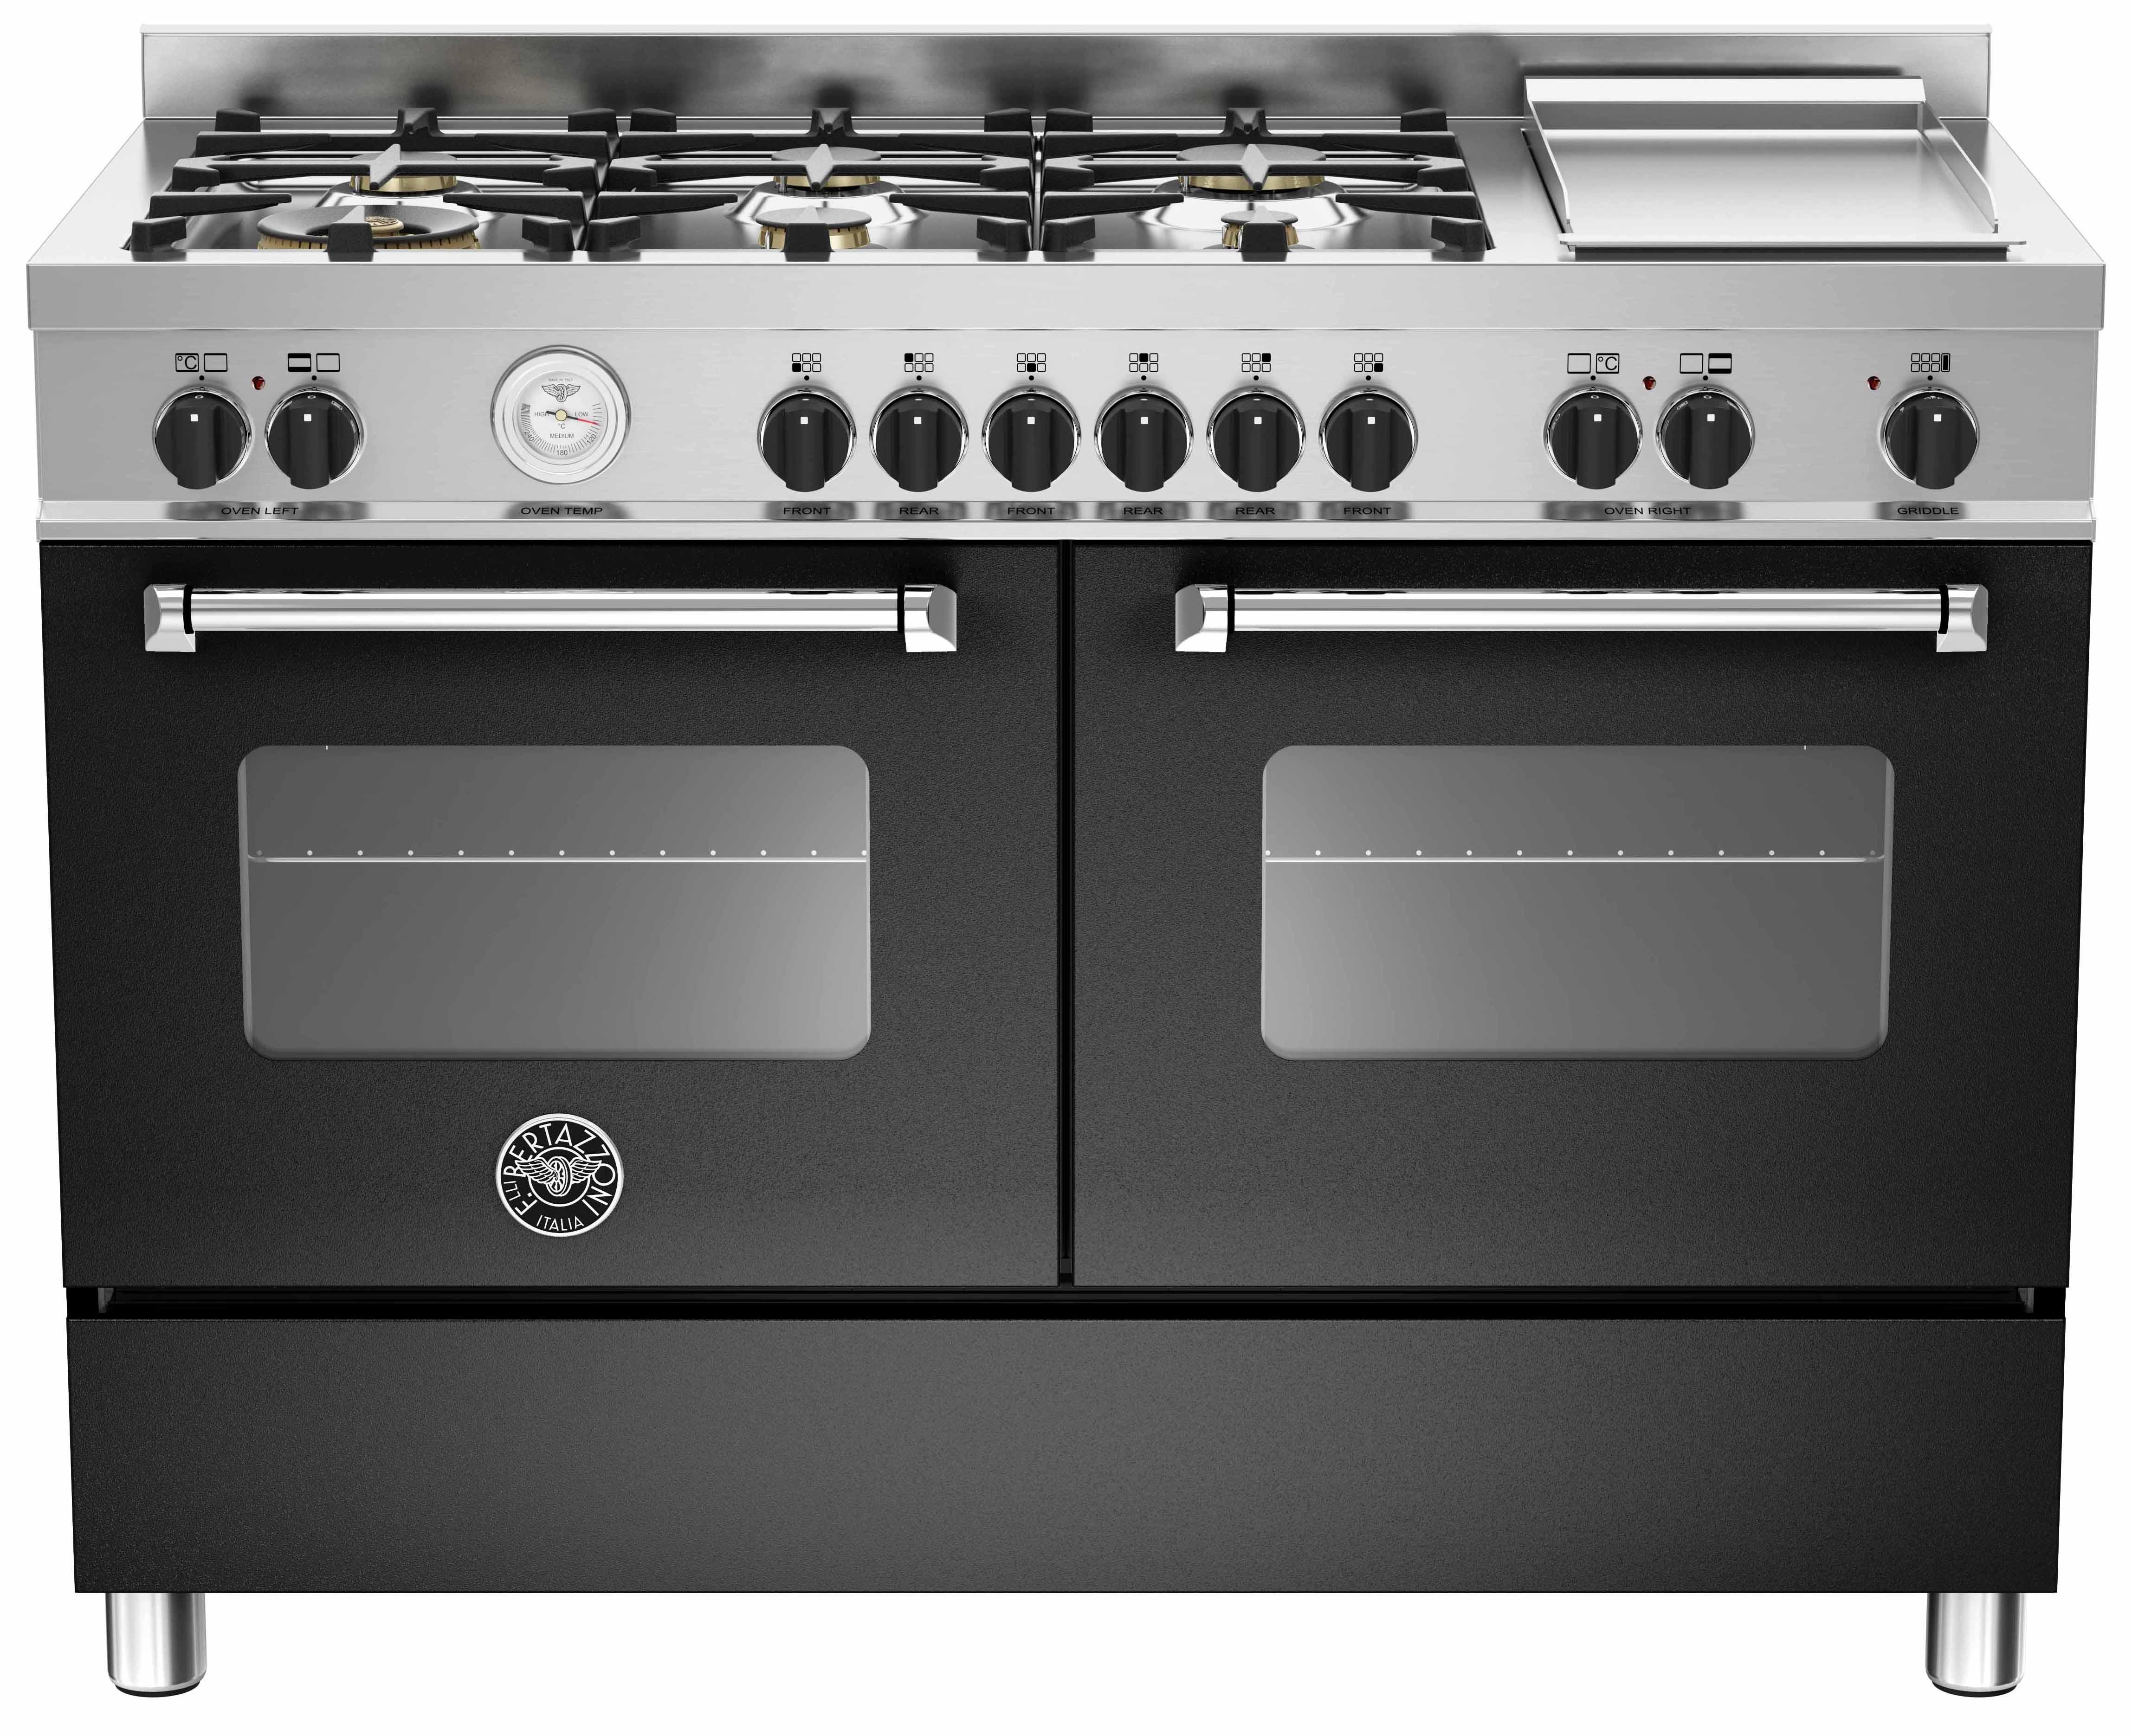 Bertazzoni MAS1206 Gasspis 120 cm, 2 ugnar, 6 brännare + elektrisk tepanyaki, Svart